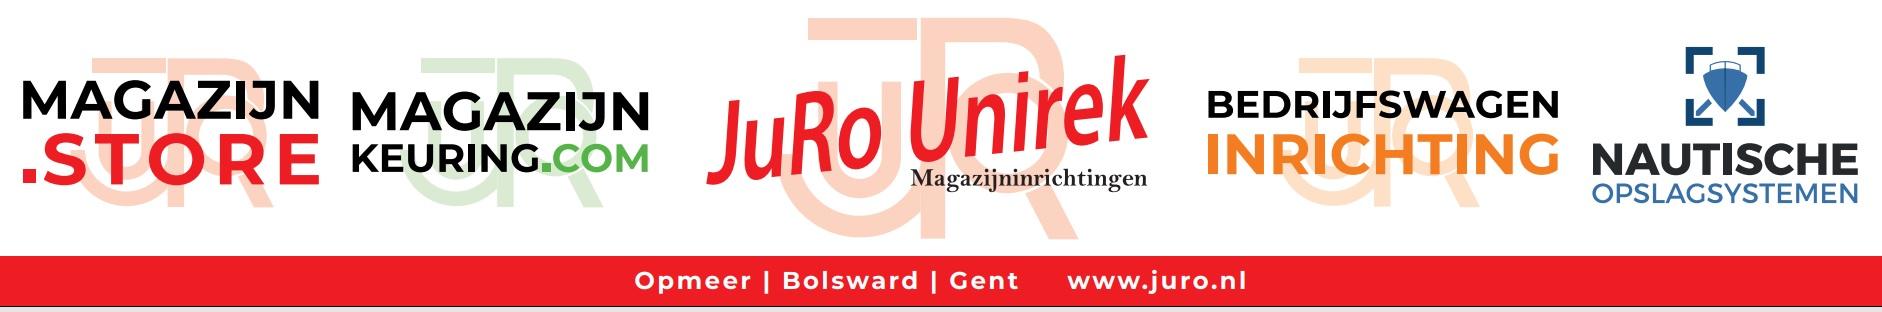 Juro Unirek gemeentetoernooi 2021